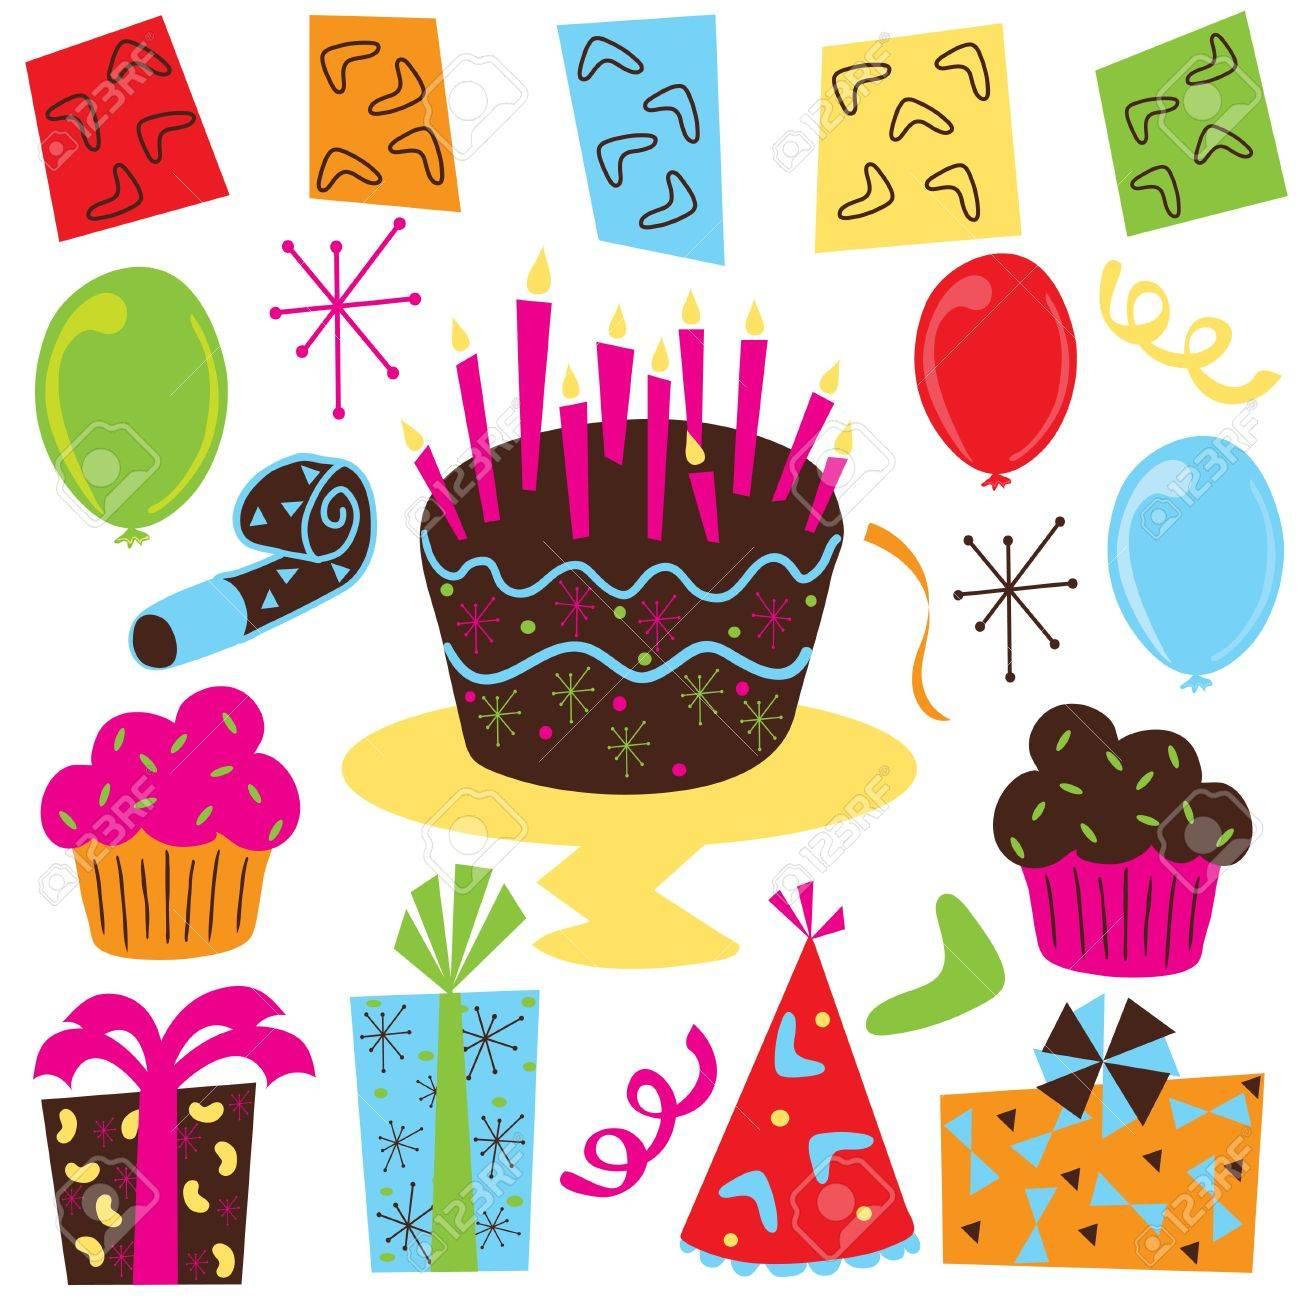 Retro Birthday Party Clipart With Birthday Cake Cupcakes